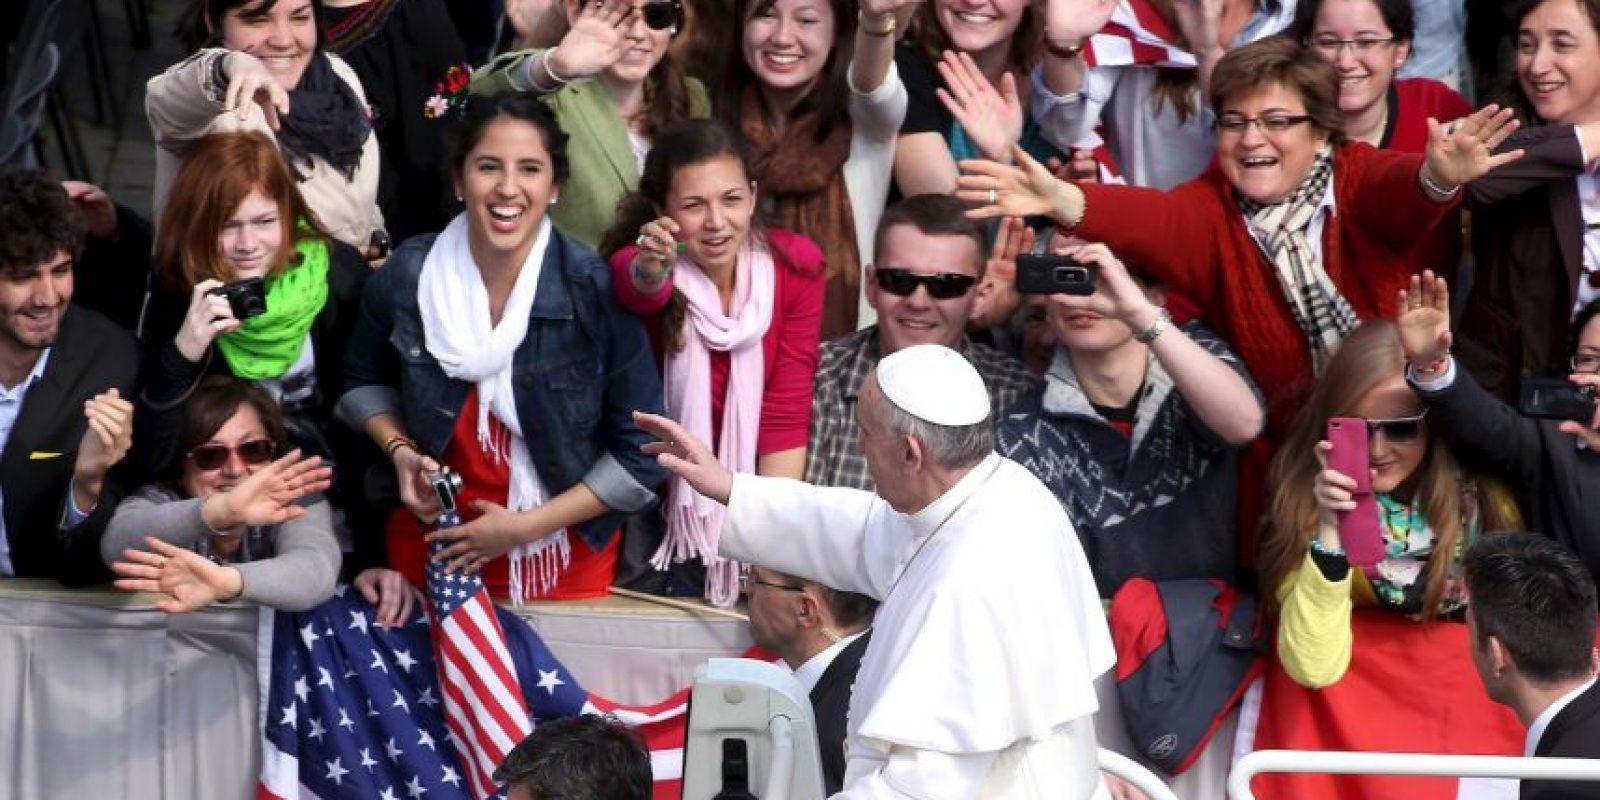 Se espera que miles de feligreses se congreguen en ese sitio. Foto:Getty Images